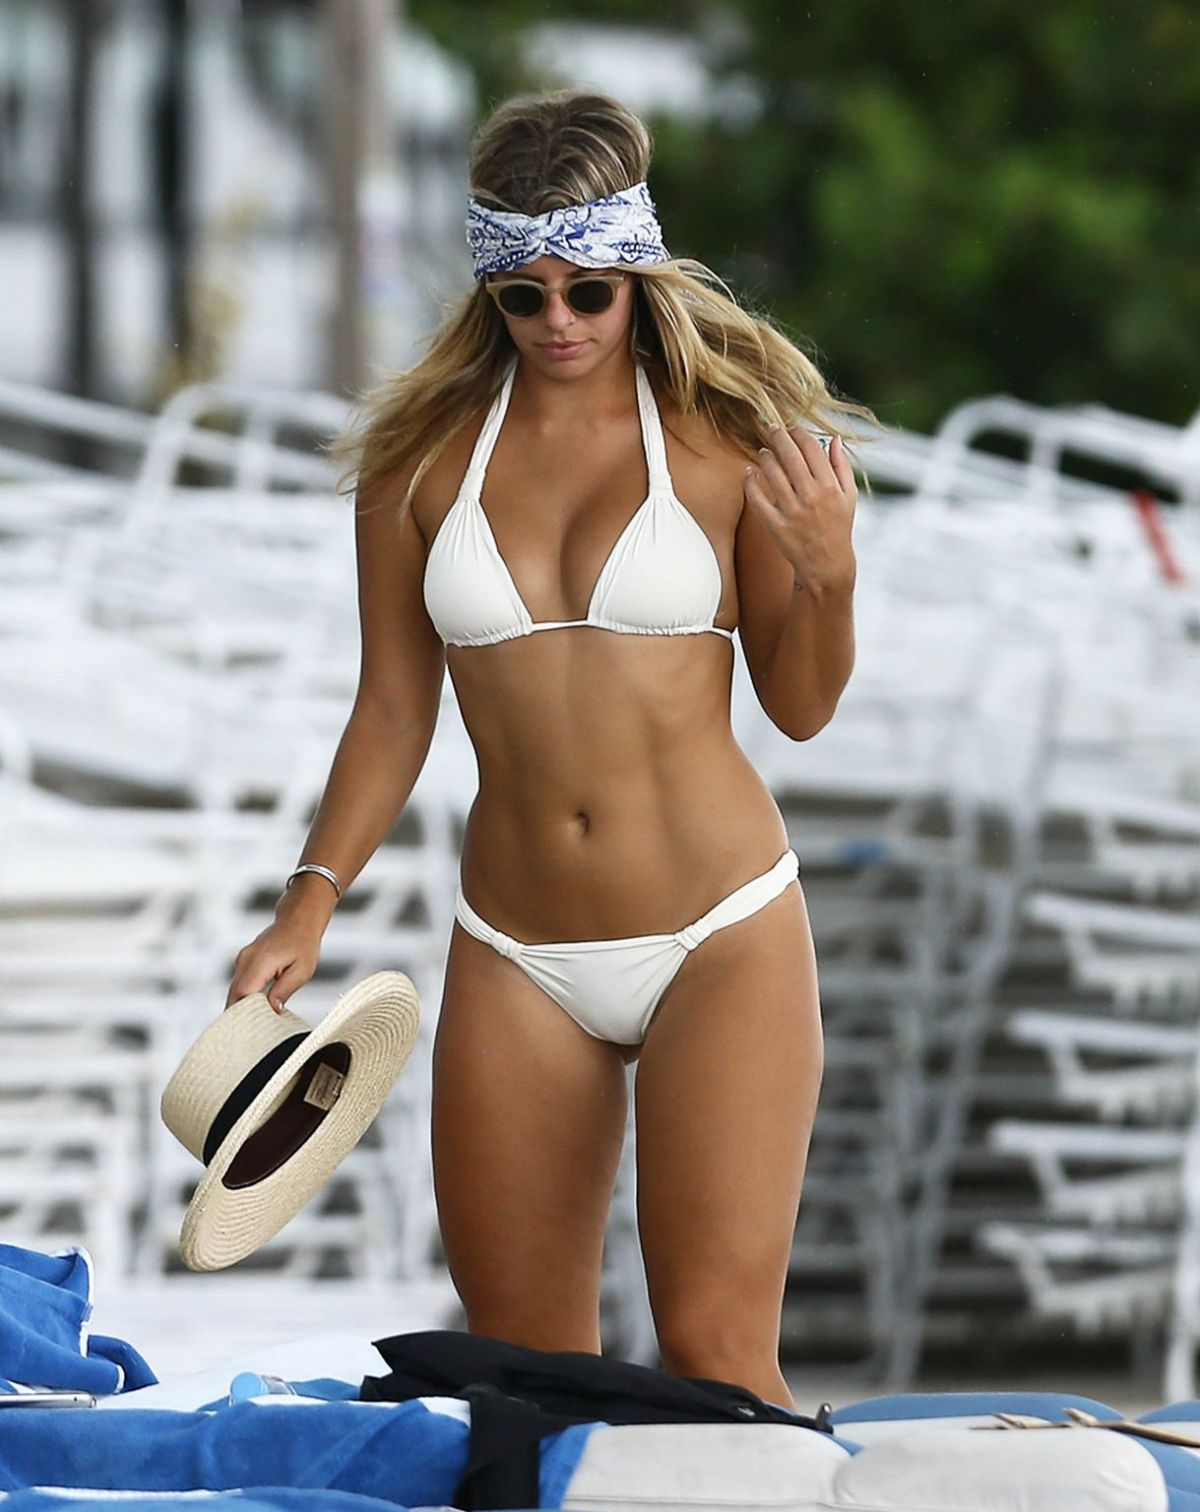 Natasha_Oakley-Miami-July_19_2015_5.jpg.